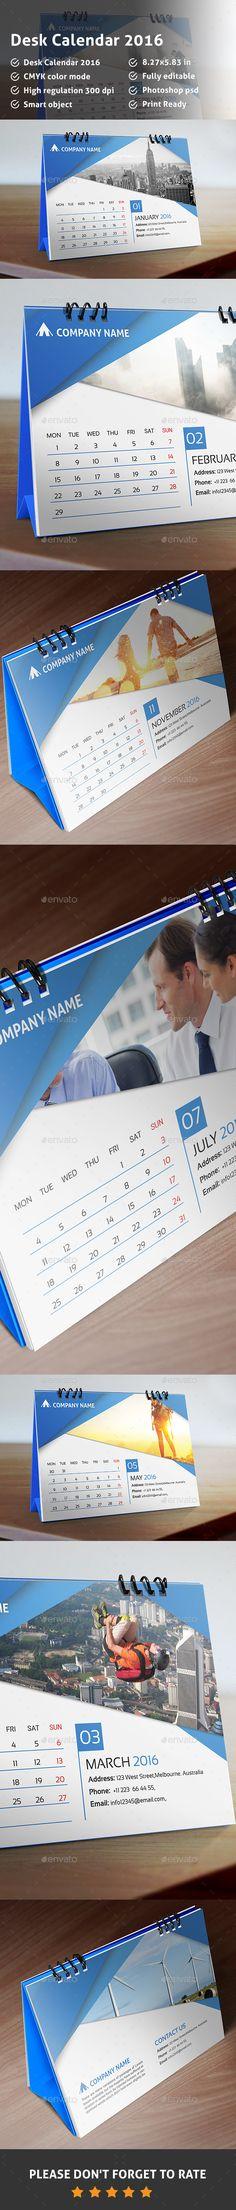 Desk Calendar 2016 Template PSD #design Download: http://graphicriver.net/item/desk-calendar-2016/13710081?ref=ksioks                                                                                                                                                                                 More